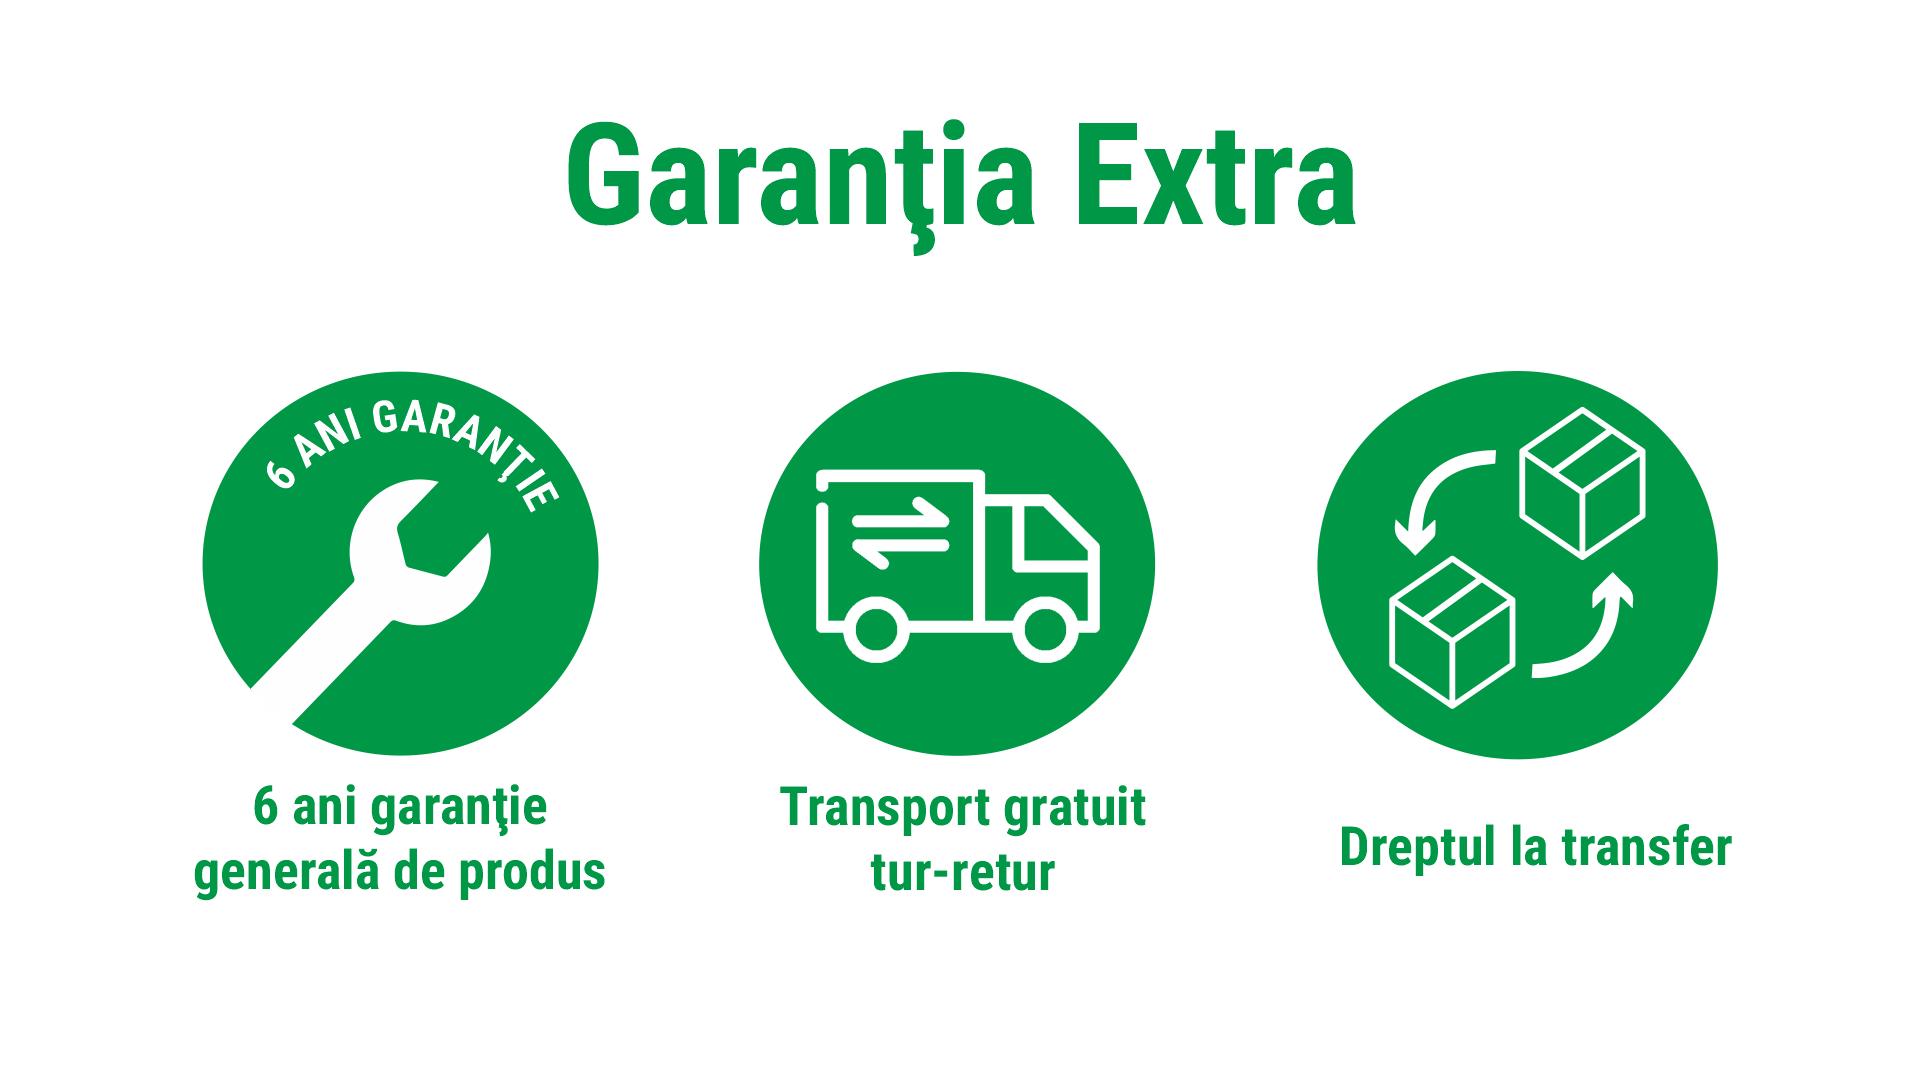 Garantie Extra beneficii